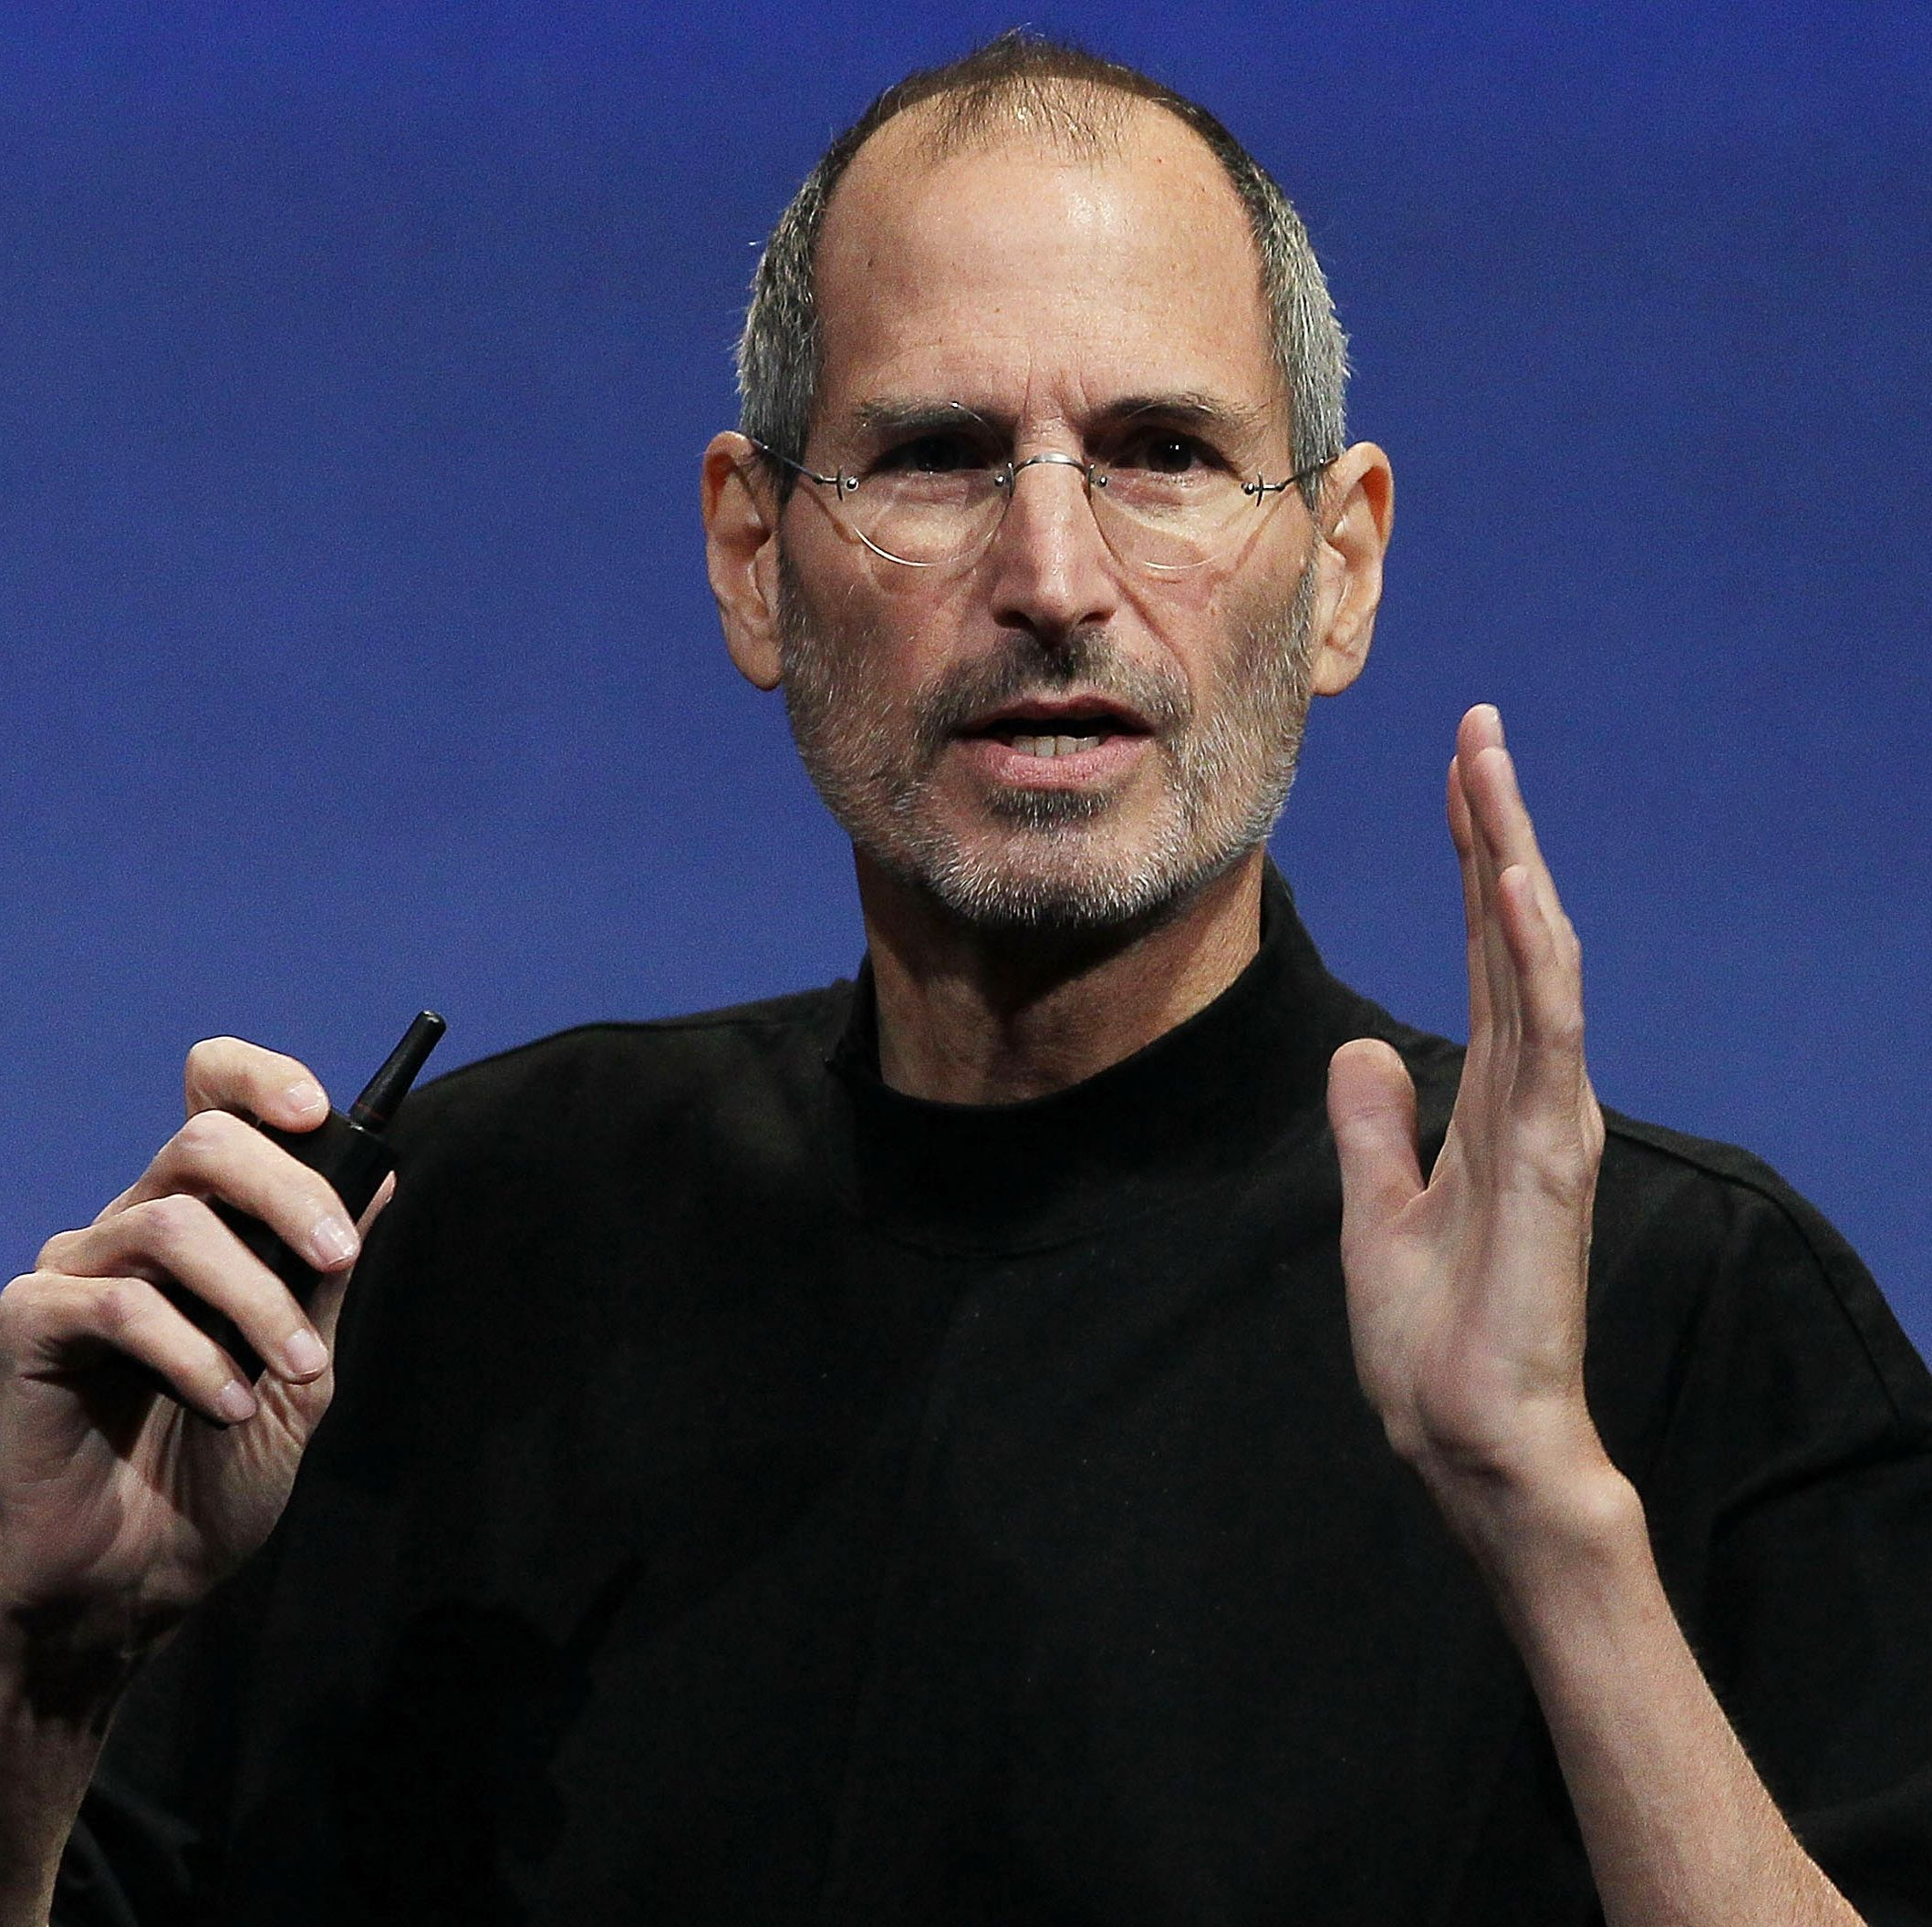 Steve Jobs in his signature Issey Miyake turtleneck.